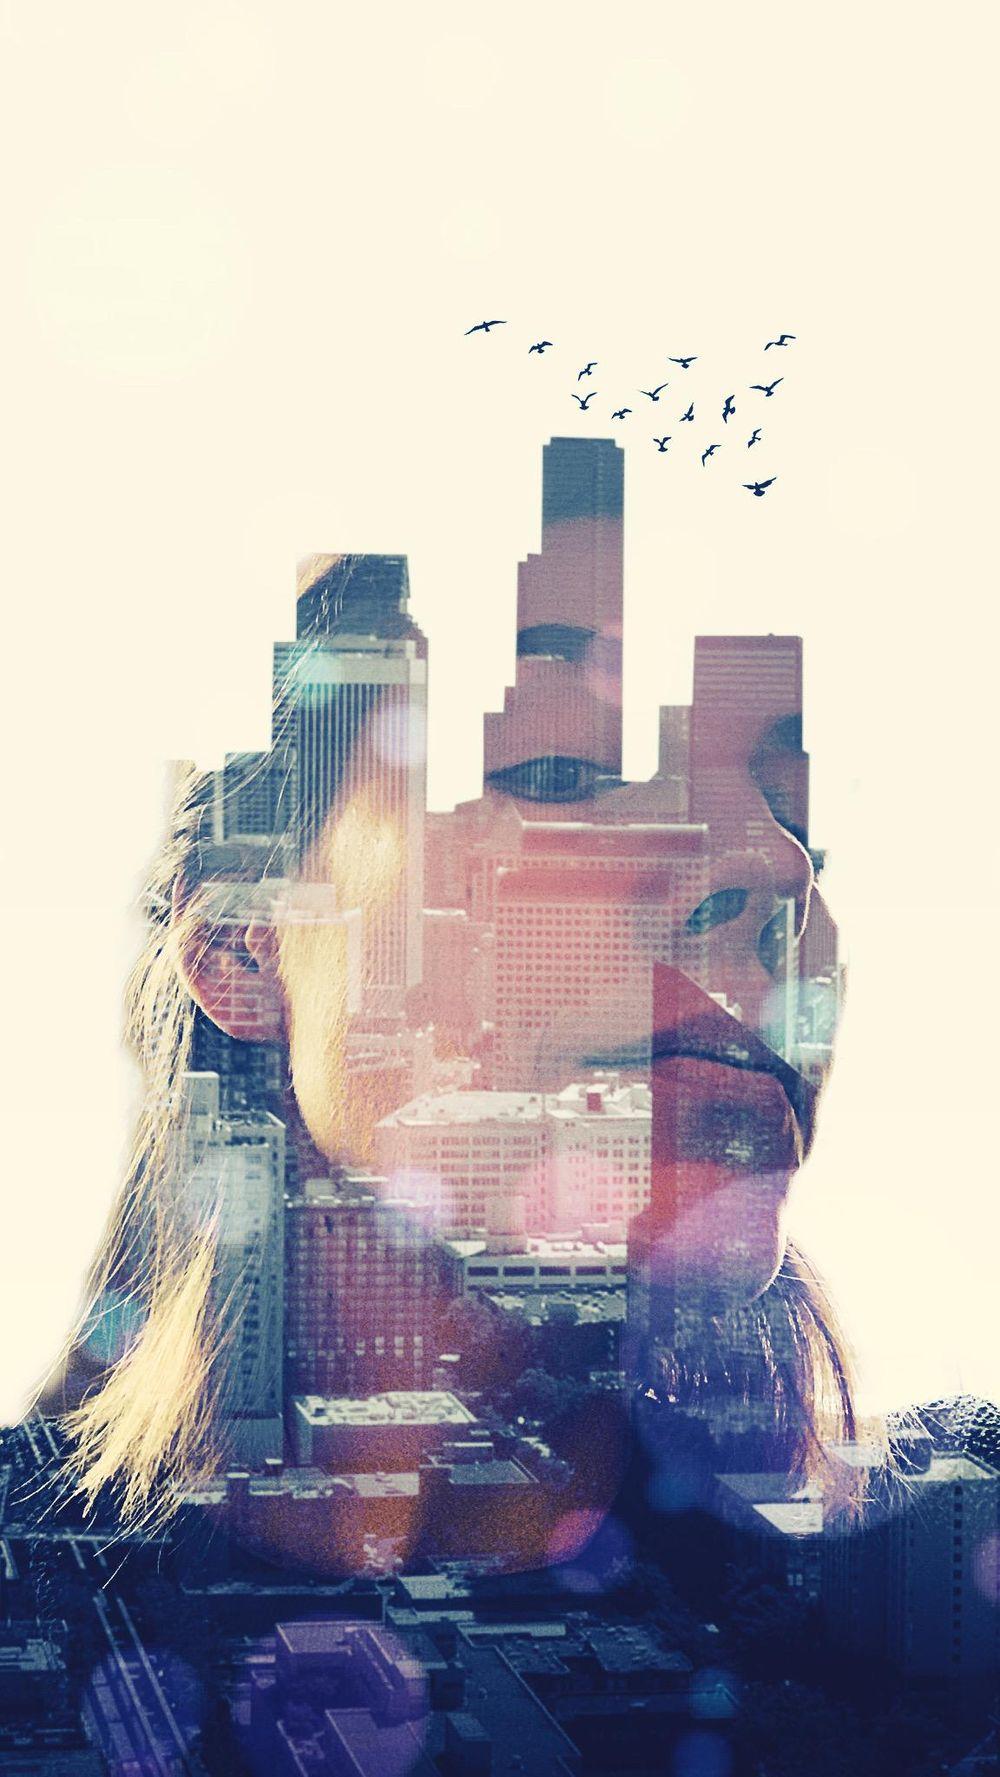 Composite Portrait Examples :) - image 8 - student project